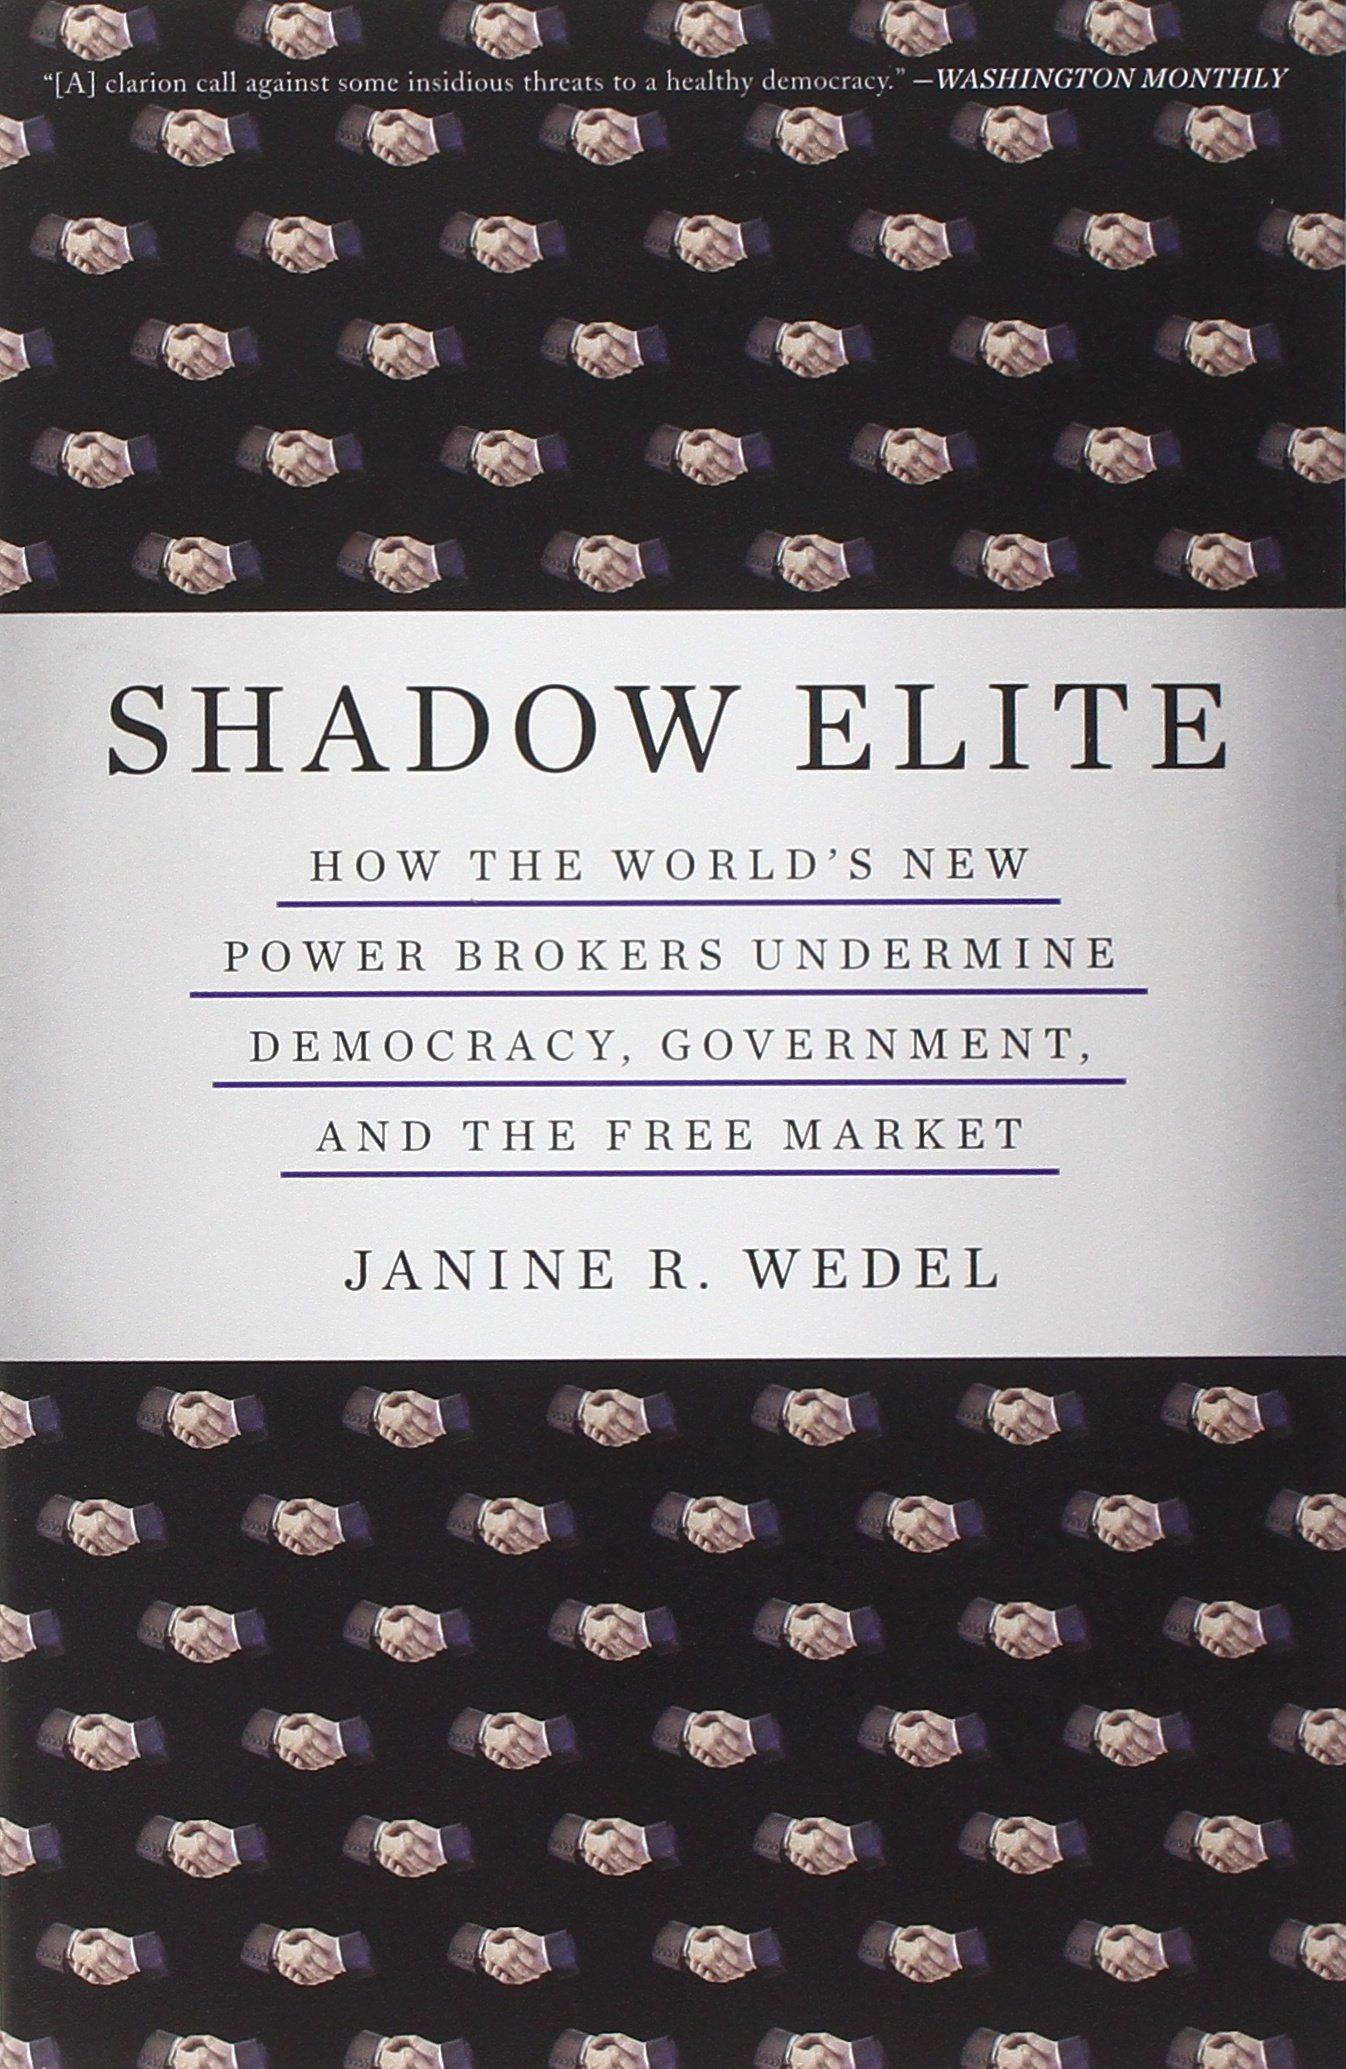 Amazon.com: Shadow Elite: How the World's New Power Brokers ...